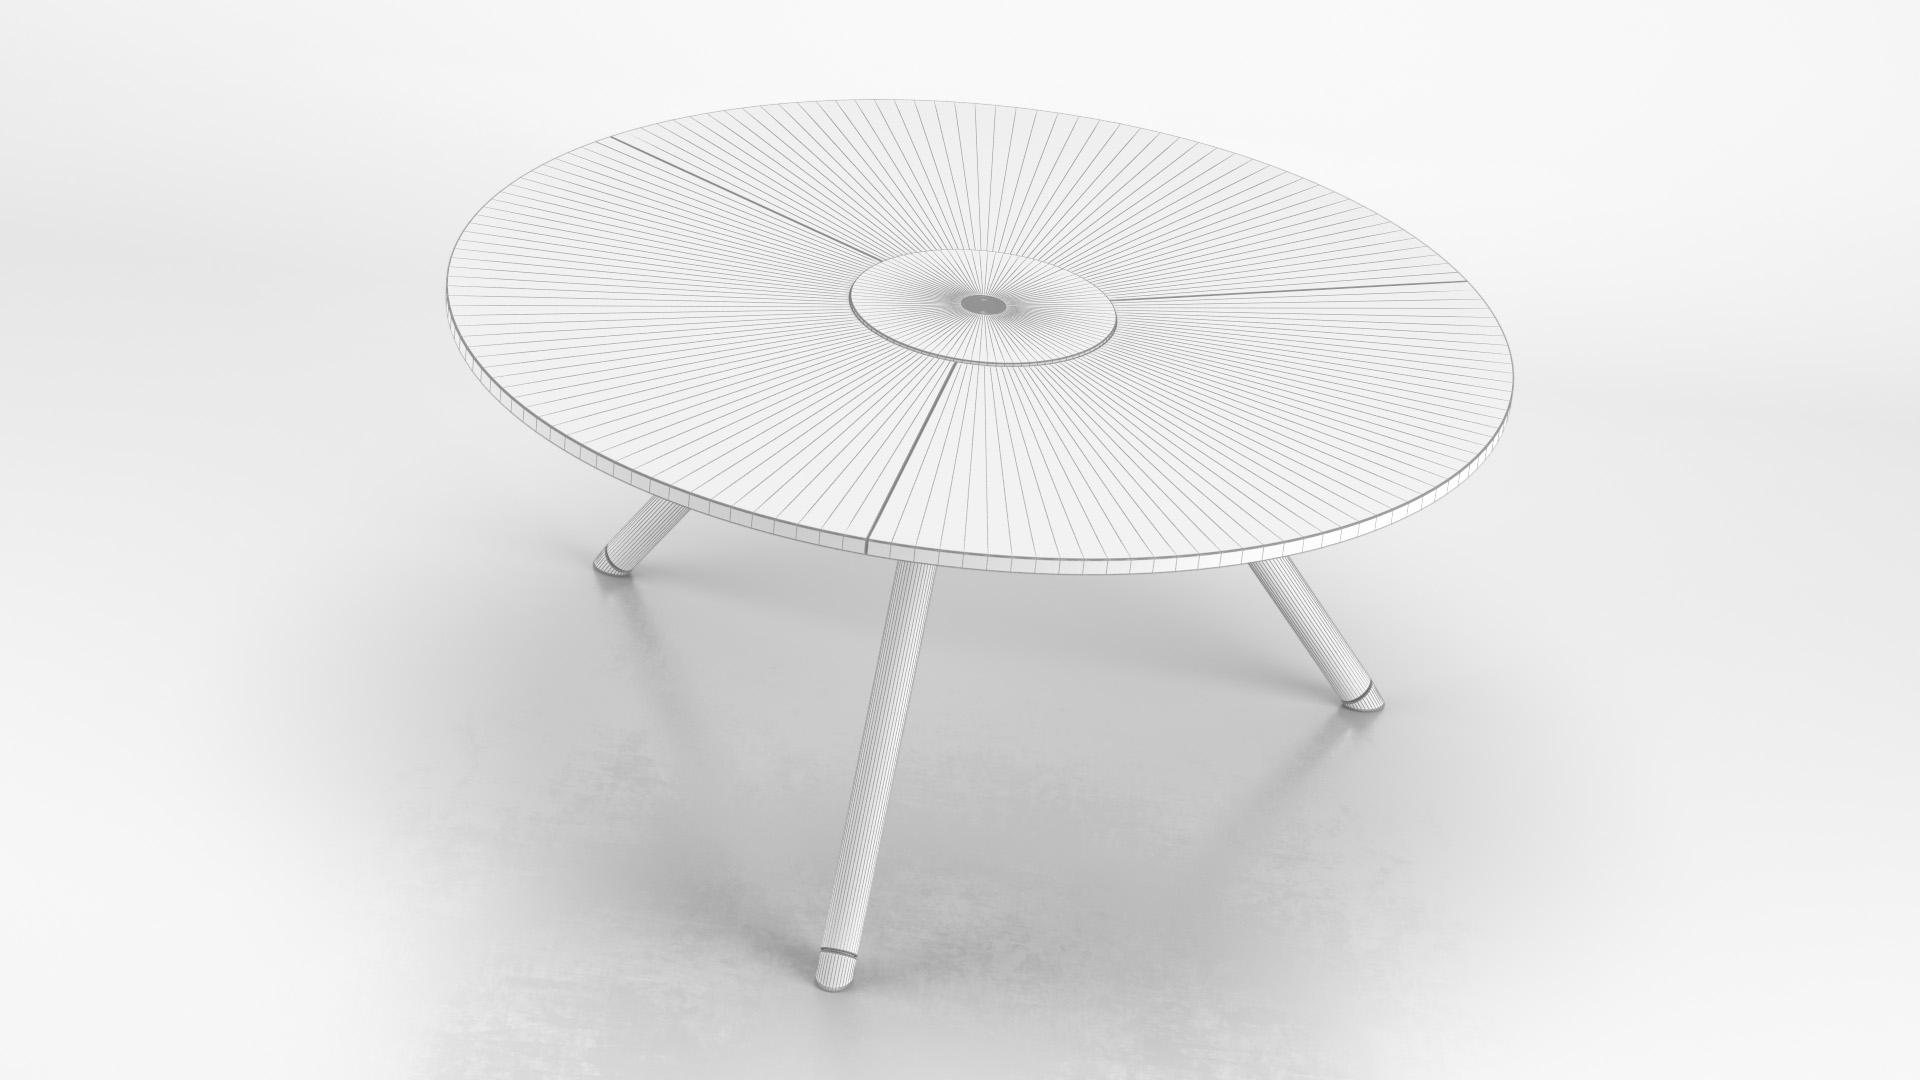 Zenith_Table_WhiteSet_01_wire_0003